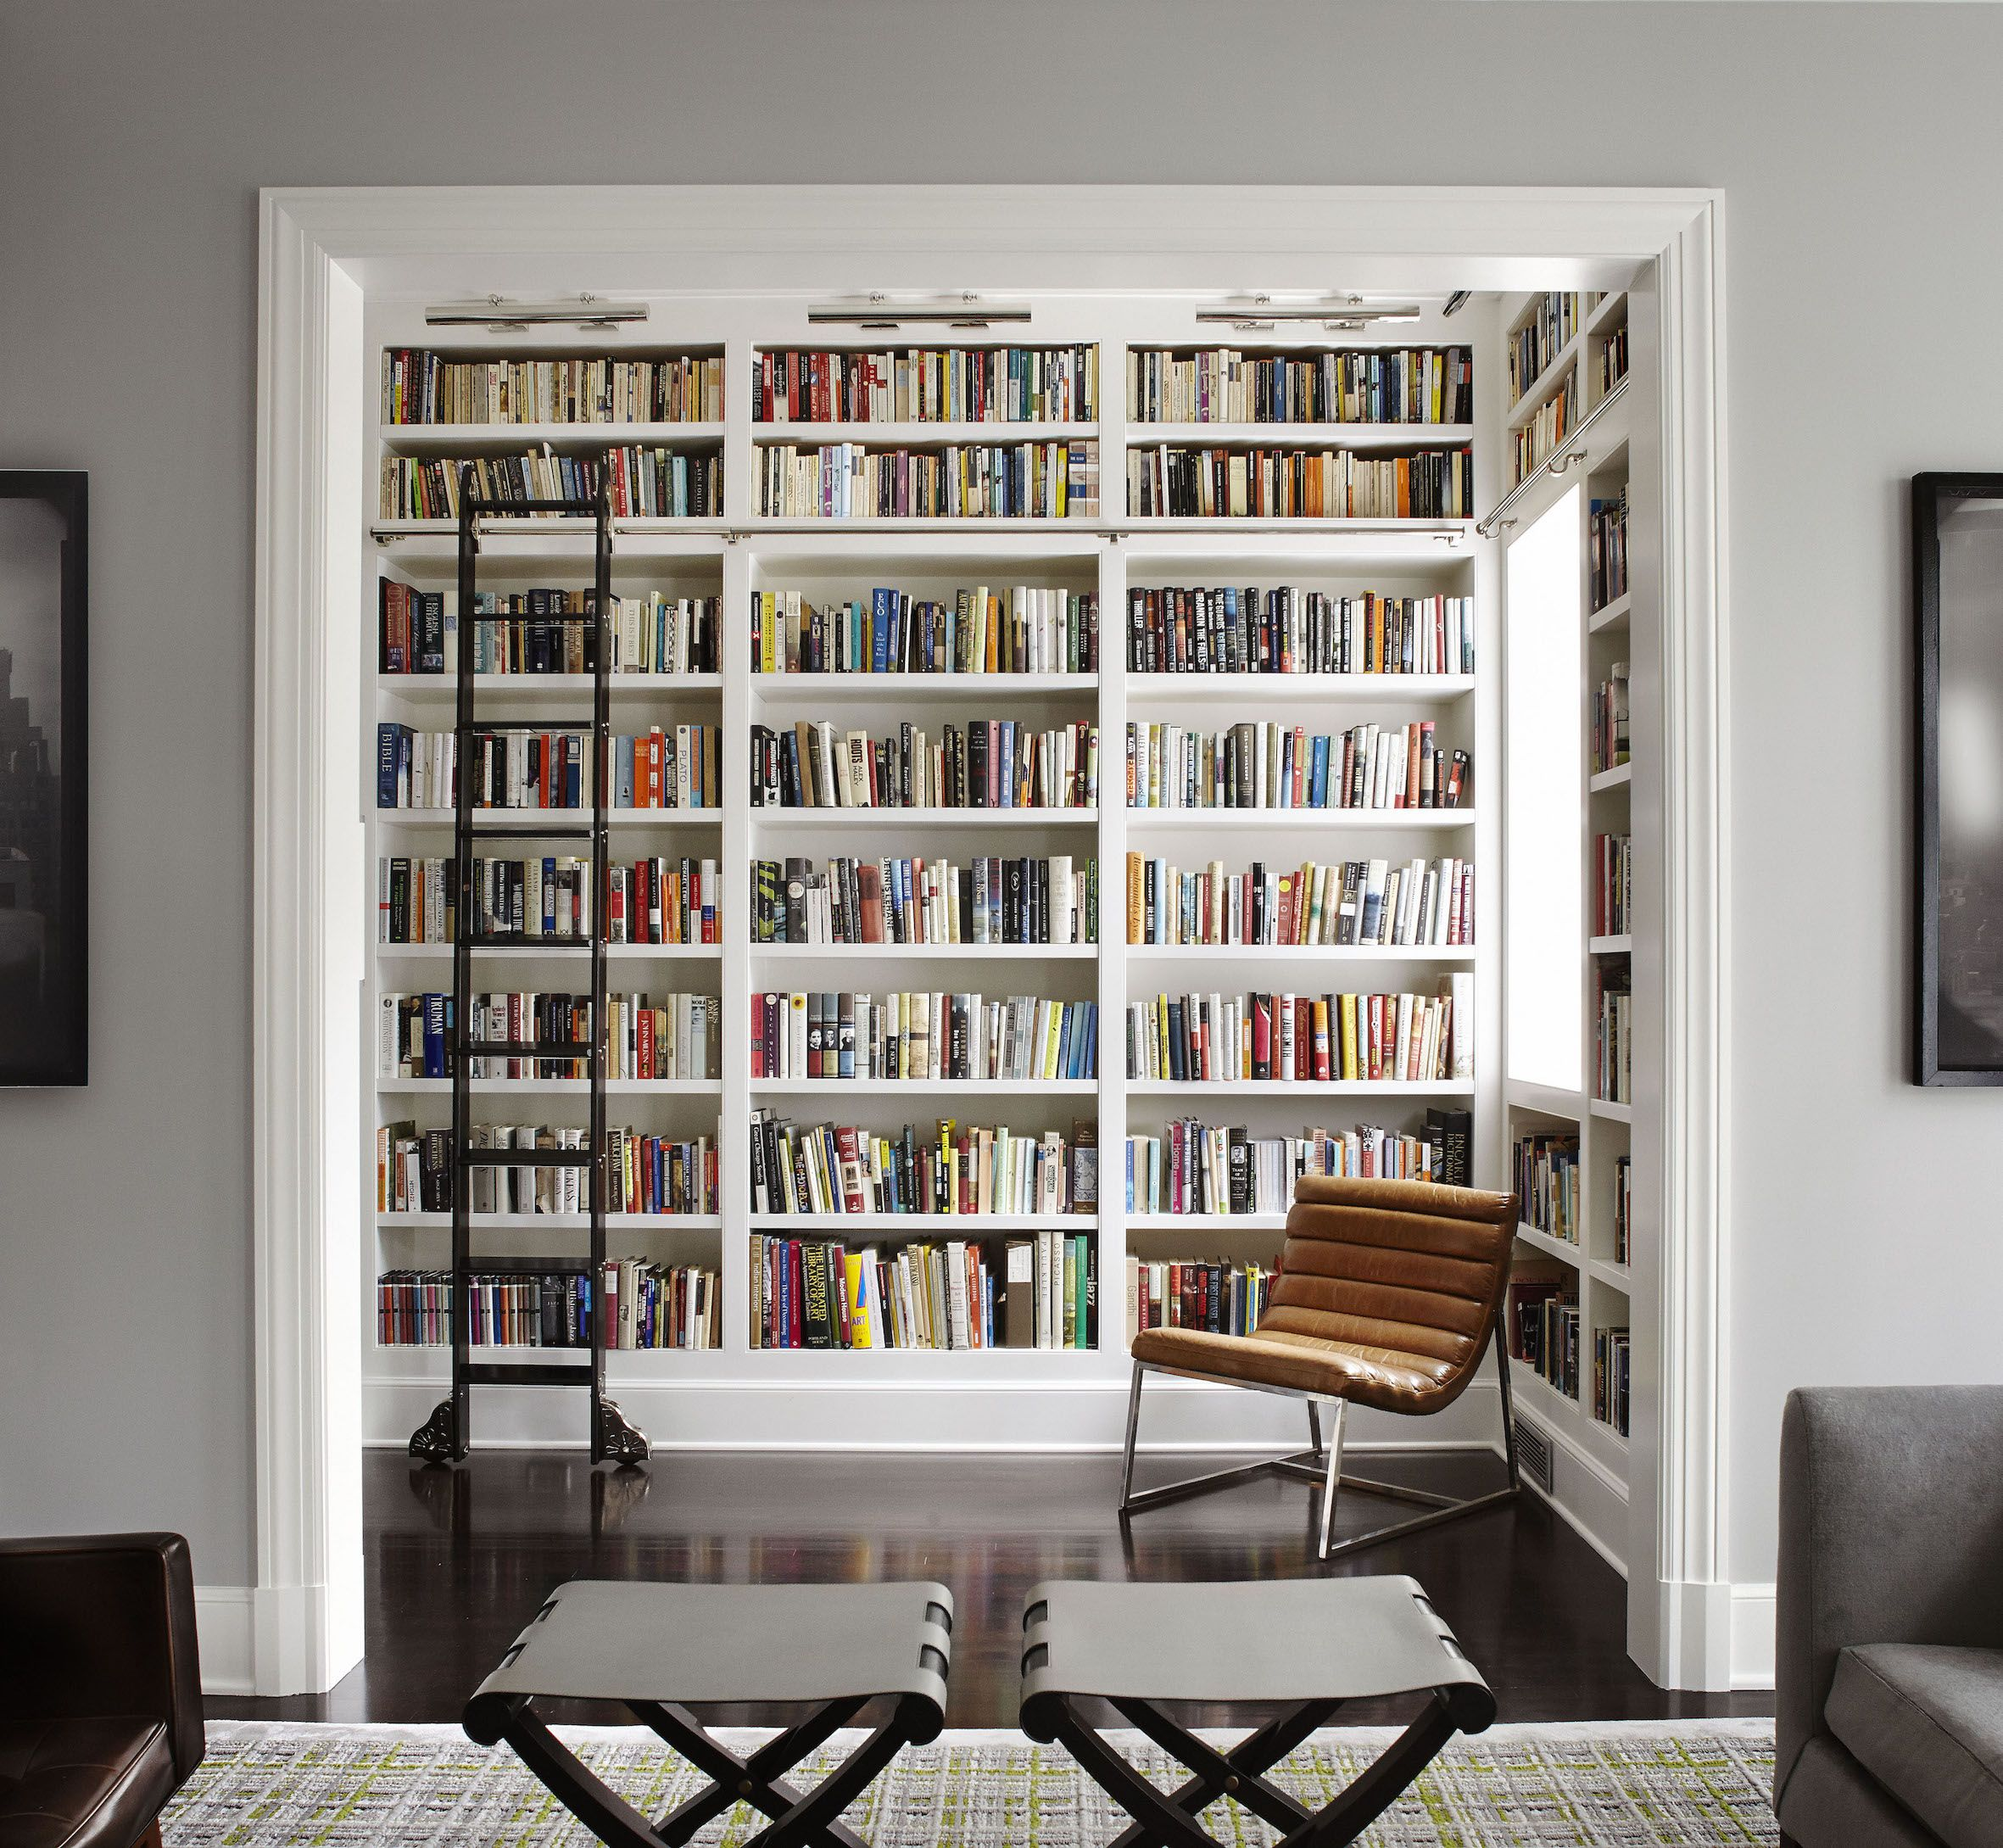 Home Library Design Ideas   Home ideas   Pinterest   Library design ...